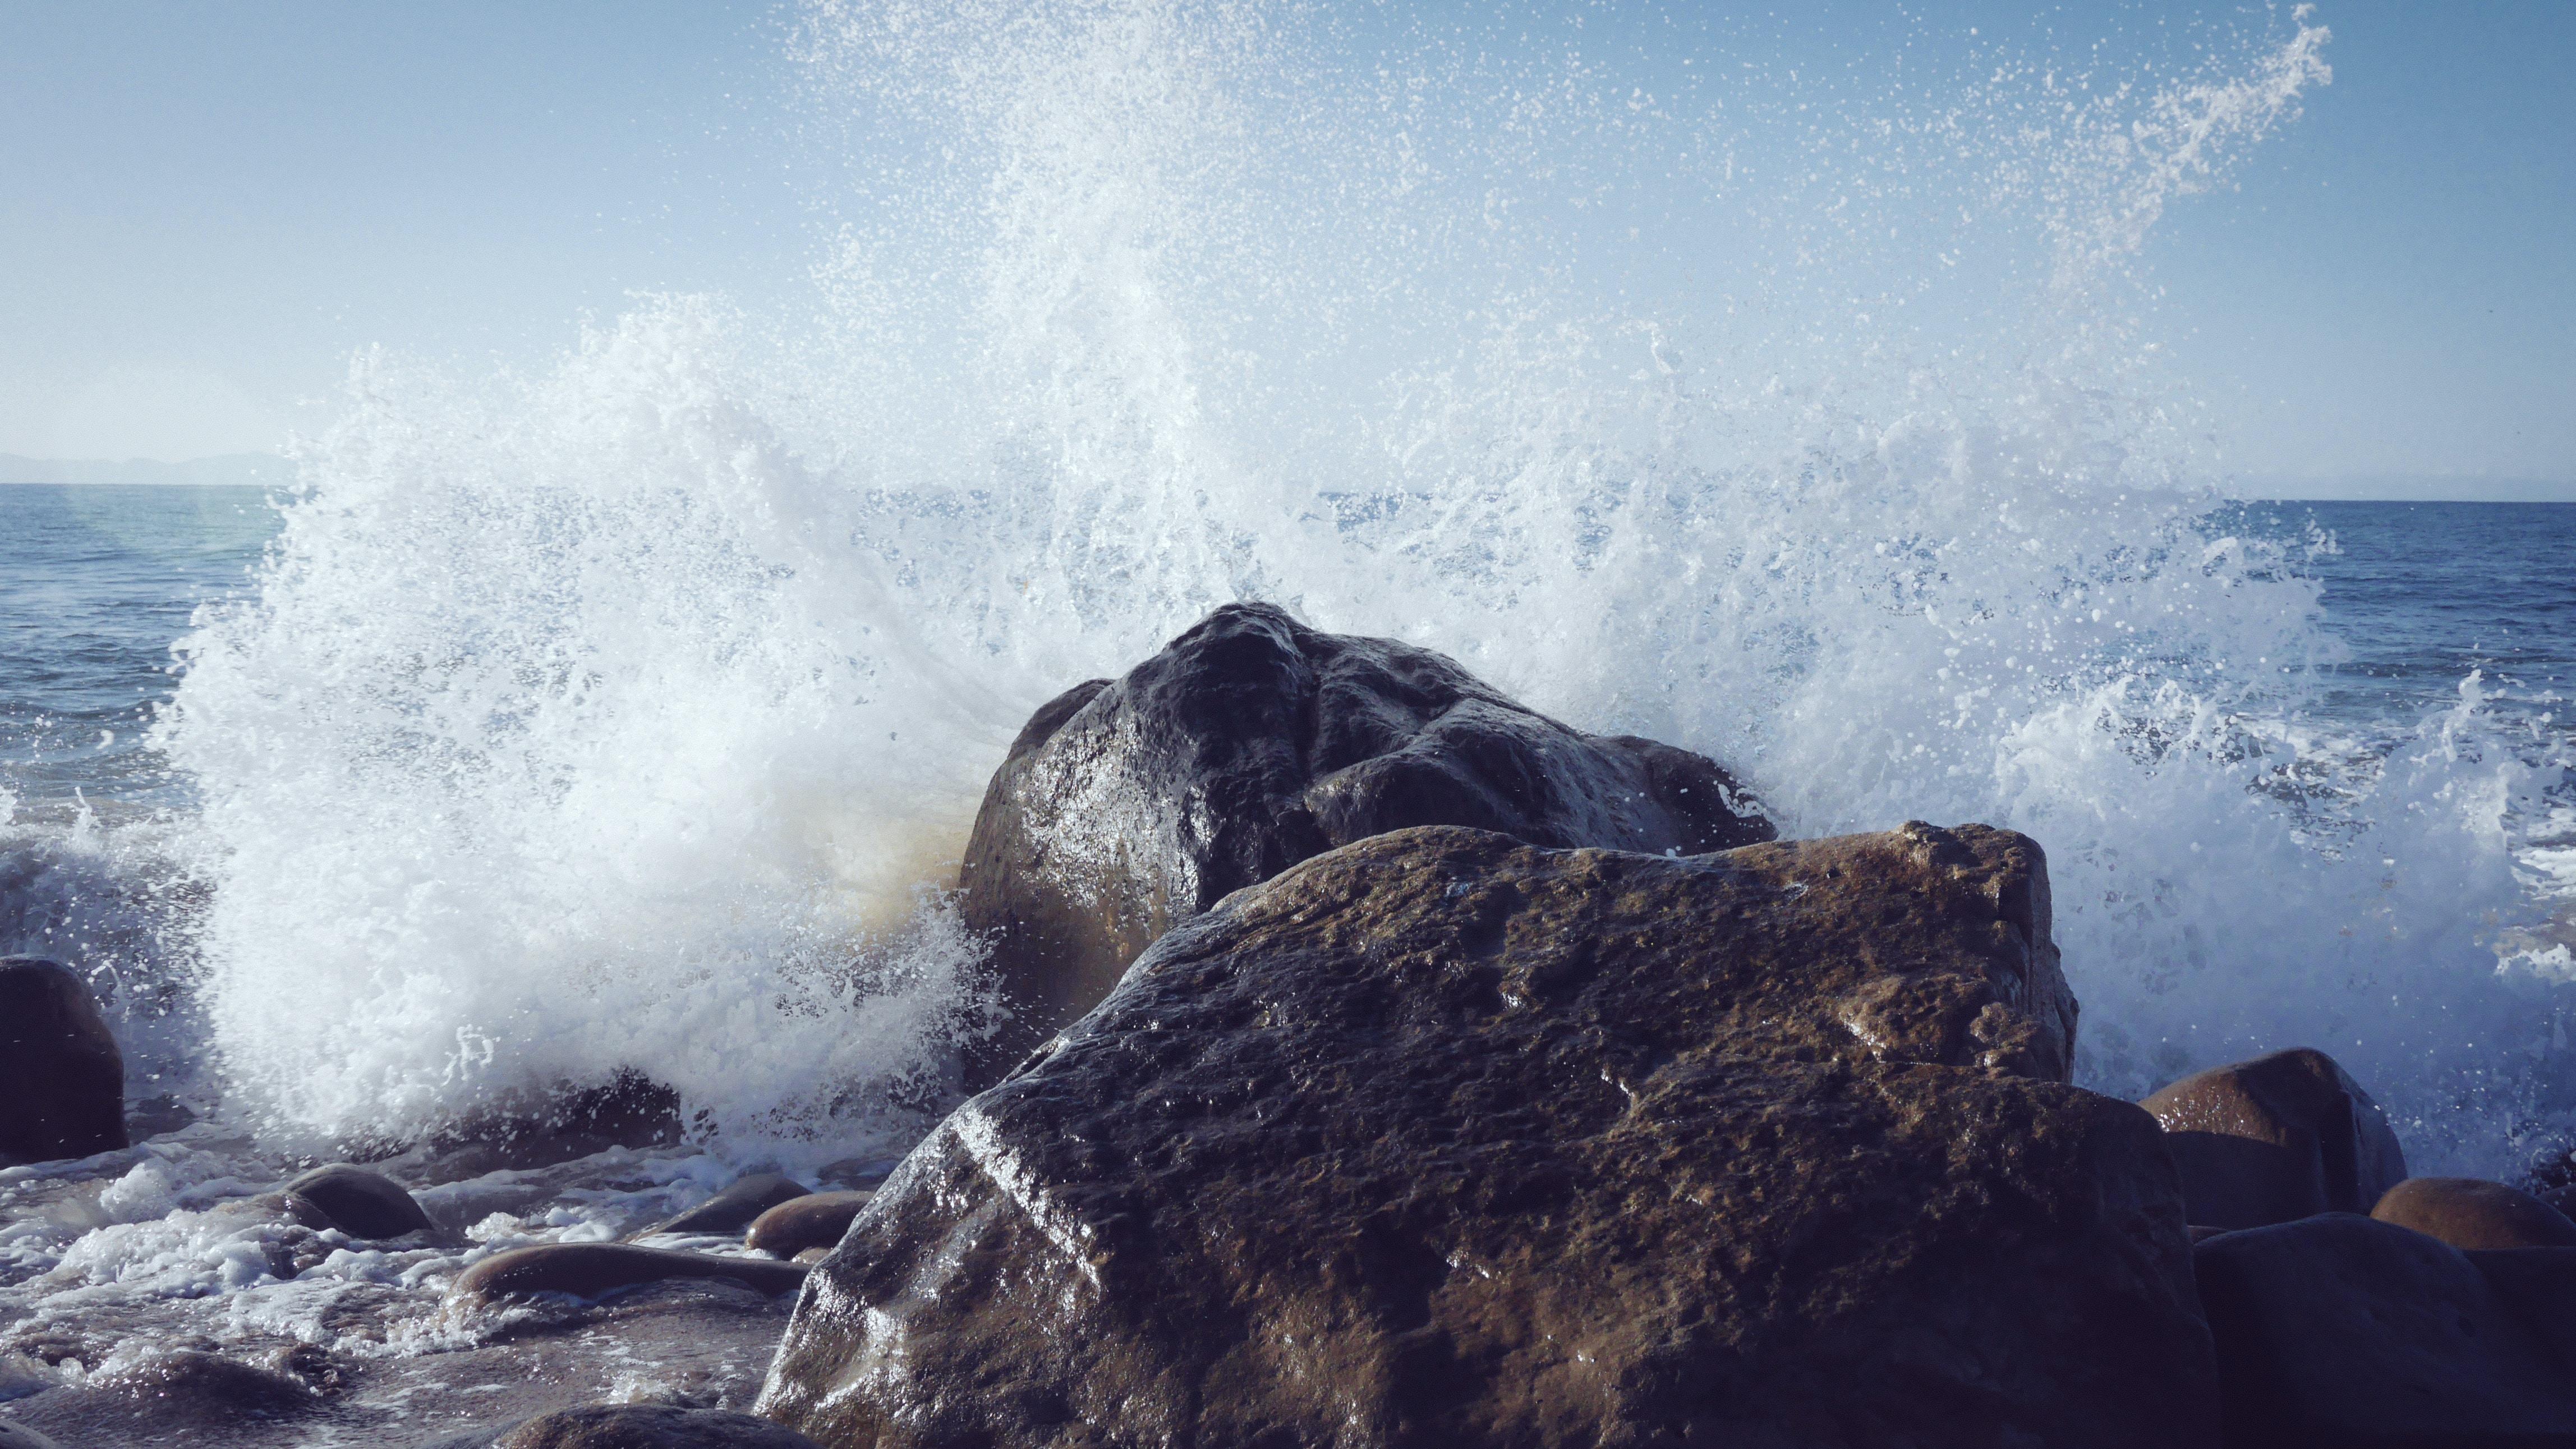 A wave splashing into a coastal rock, causing spray